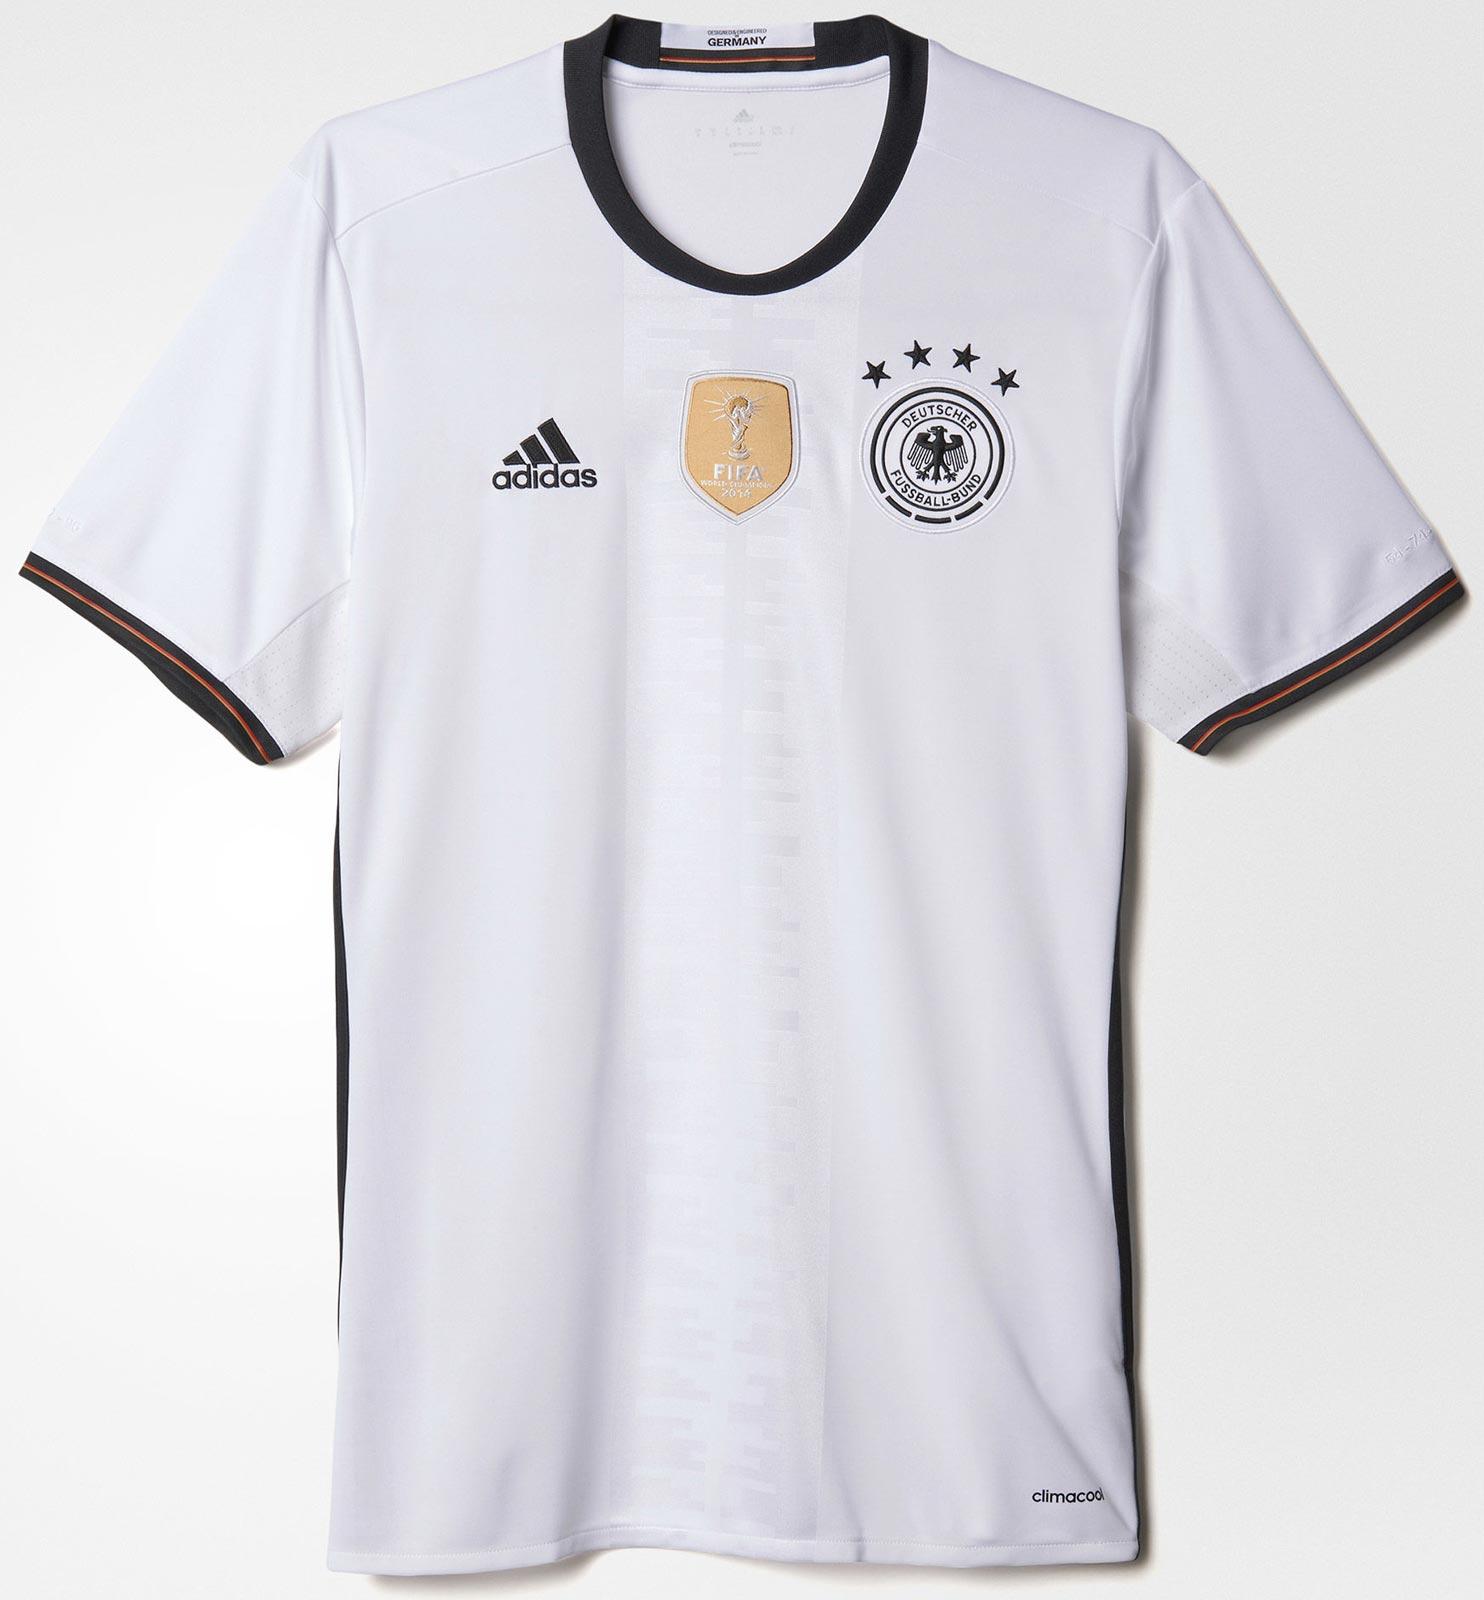 4e868f968 Adidas Germany Euro 2016 Home Jersey